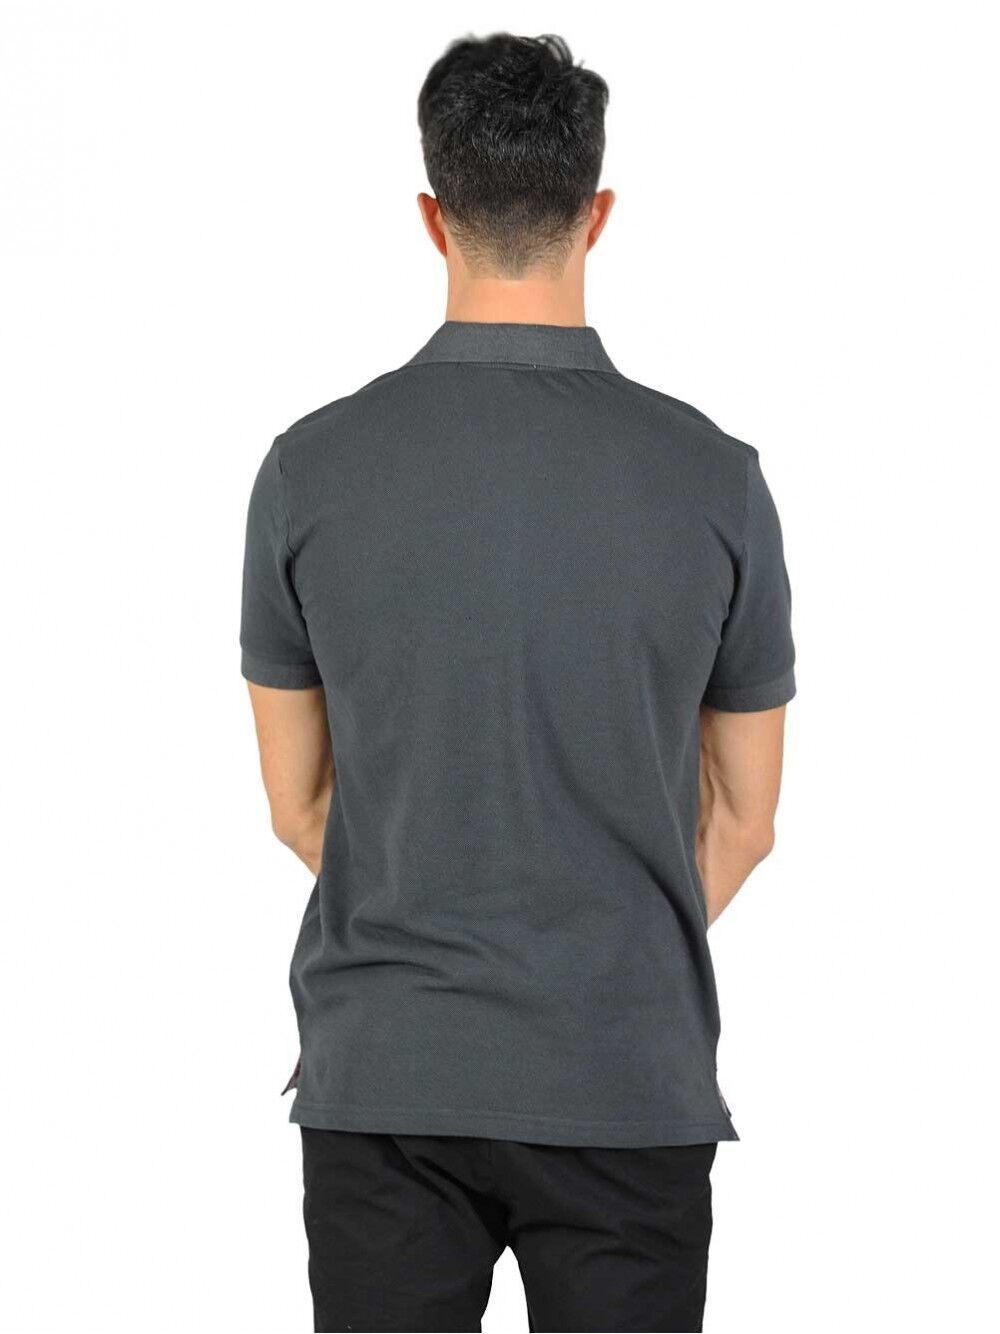 ARMANI JEANS bianco T-Shirt-Maglietta da uomo 8N6D01 in bianco JEANS 5bbe9c